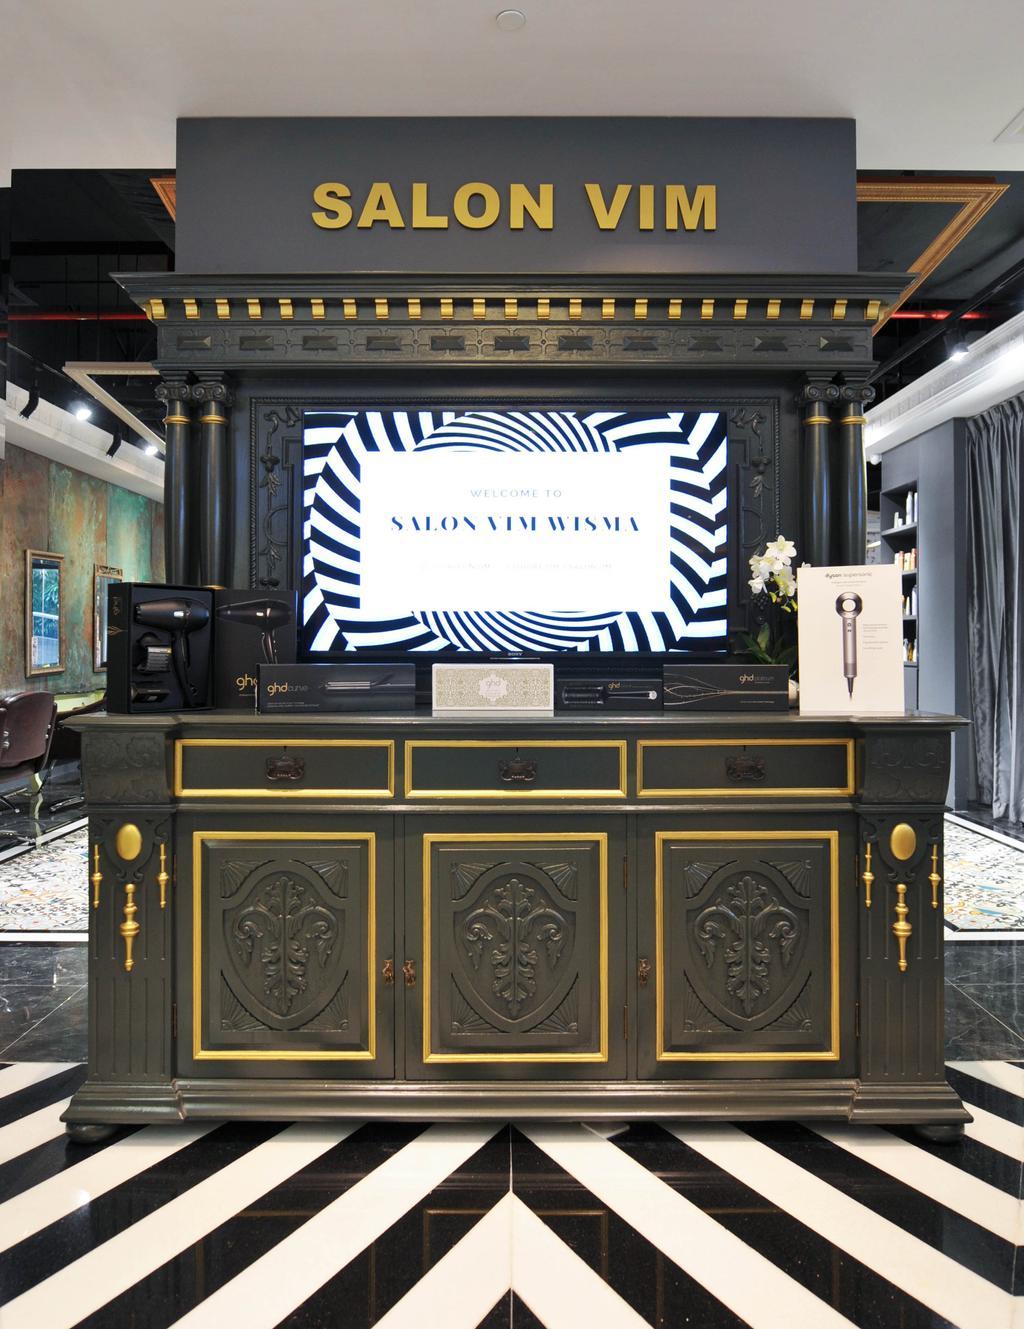 Salon Vim at Wisma Atria, Commercial, Interior Designer, Seven Heaven, Modern, Luggage, Suitcase